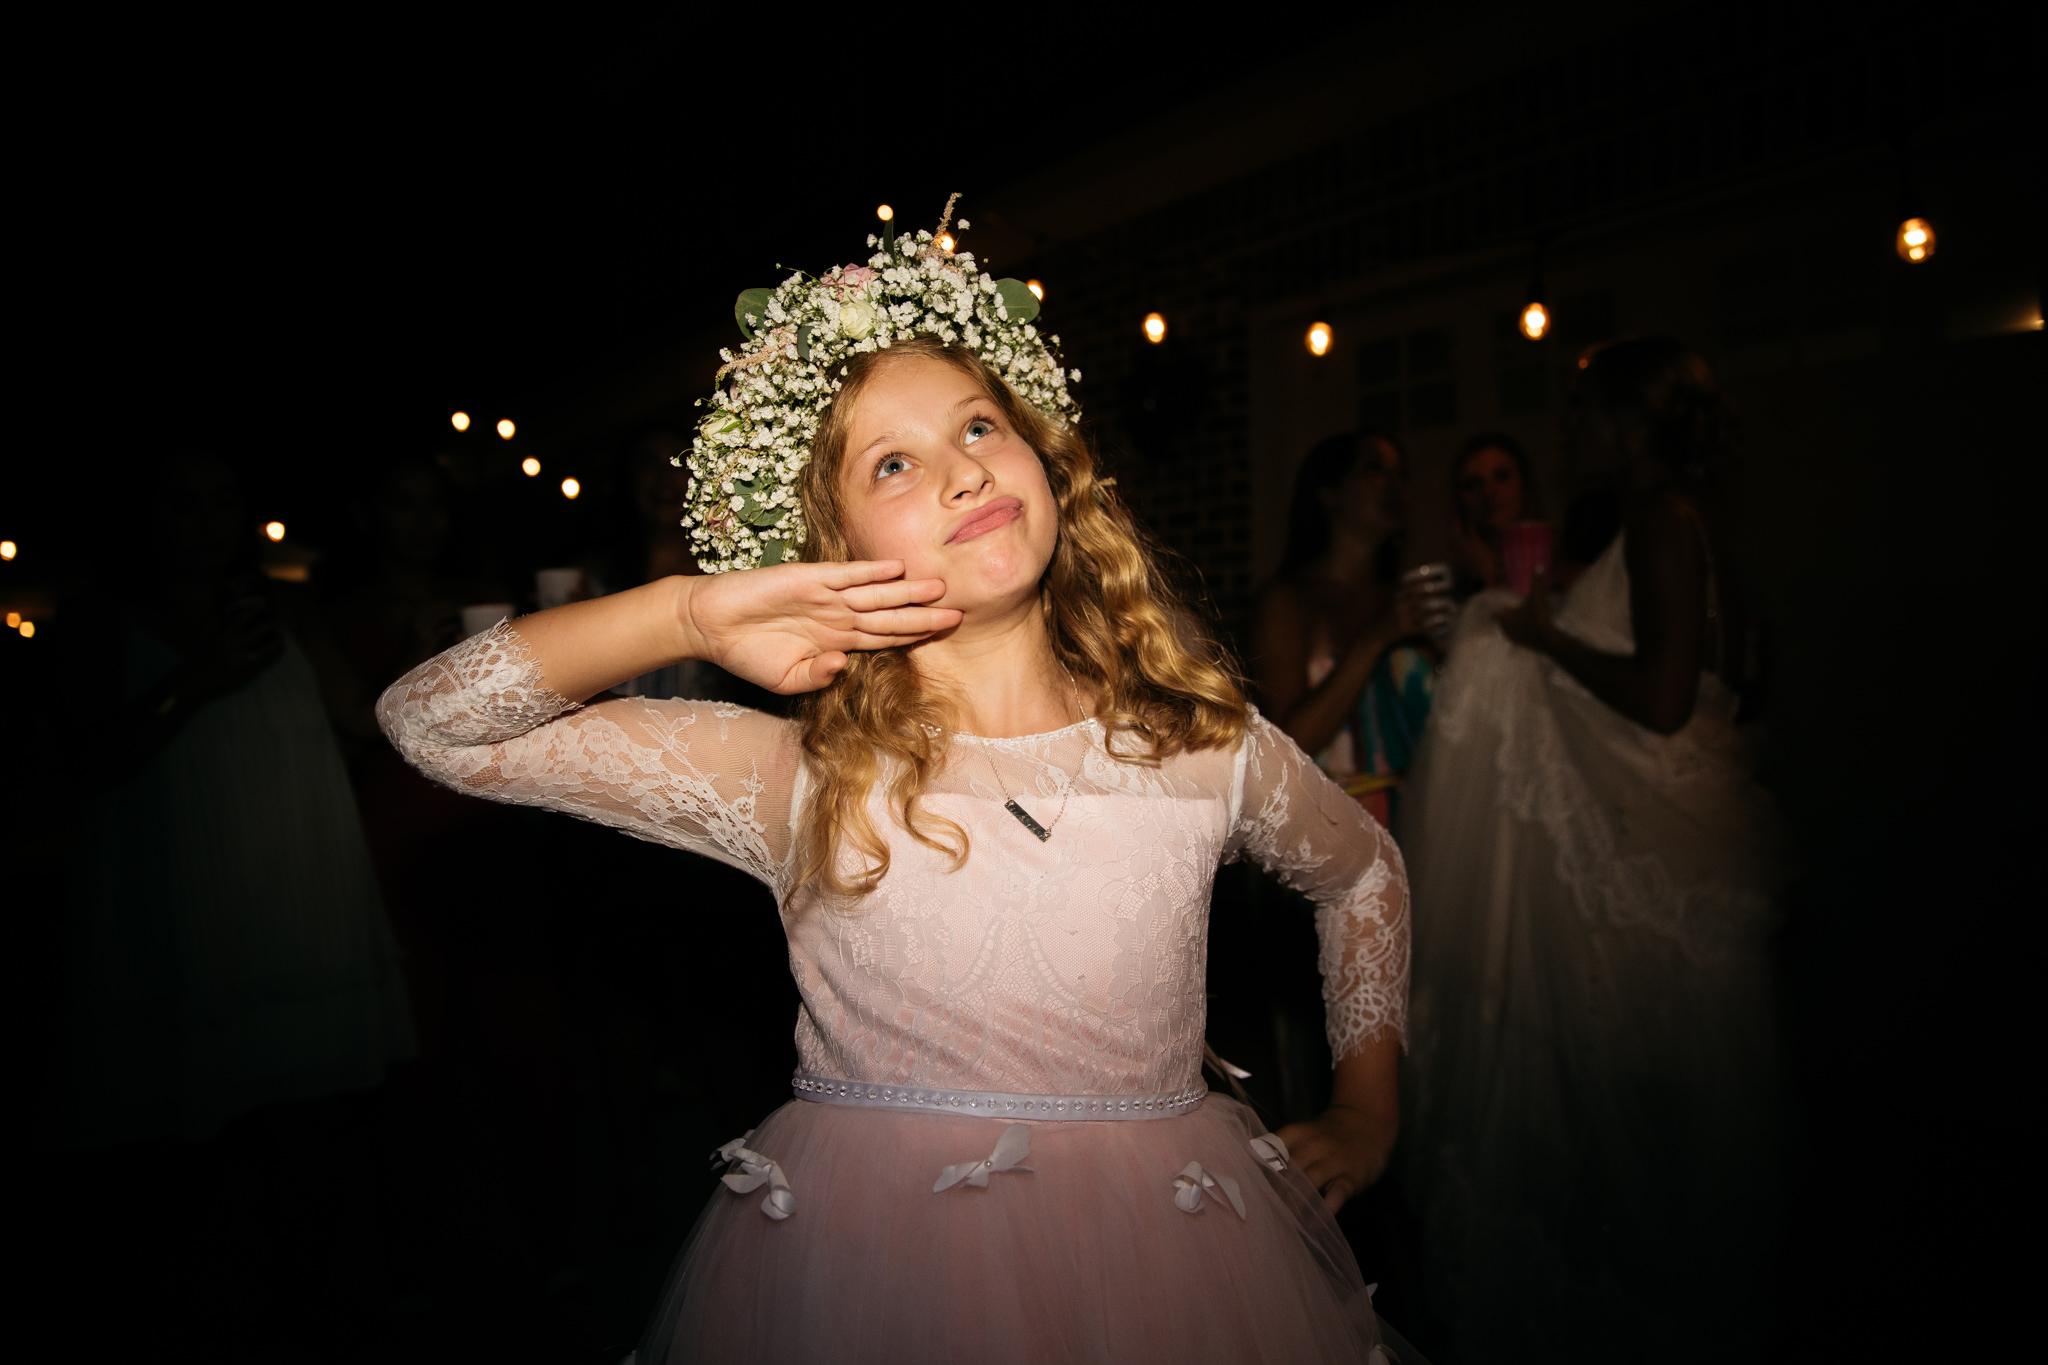 backyard-wedding-thewarmtharoundyou-lexy-branson-88.jpg